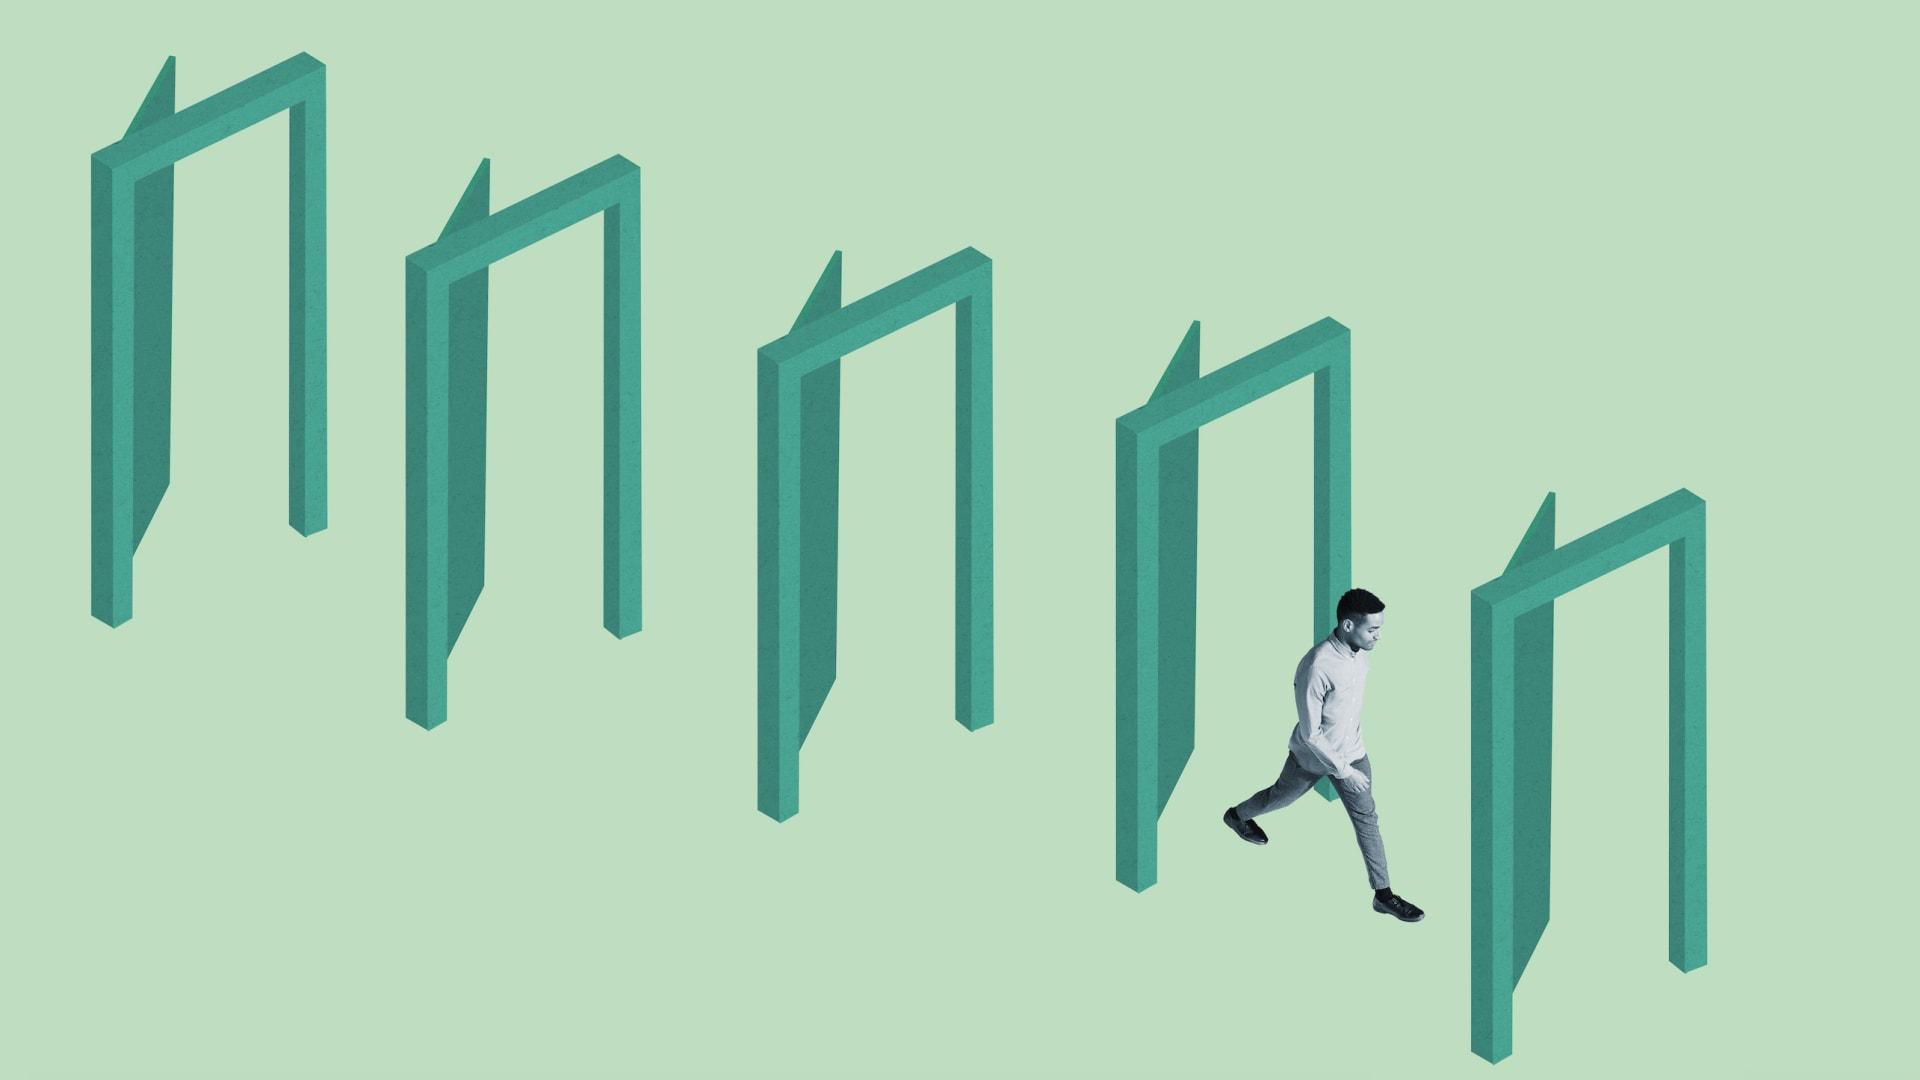 5 Steps to Prepare for the Close-Open-Close Economy